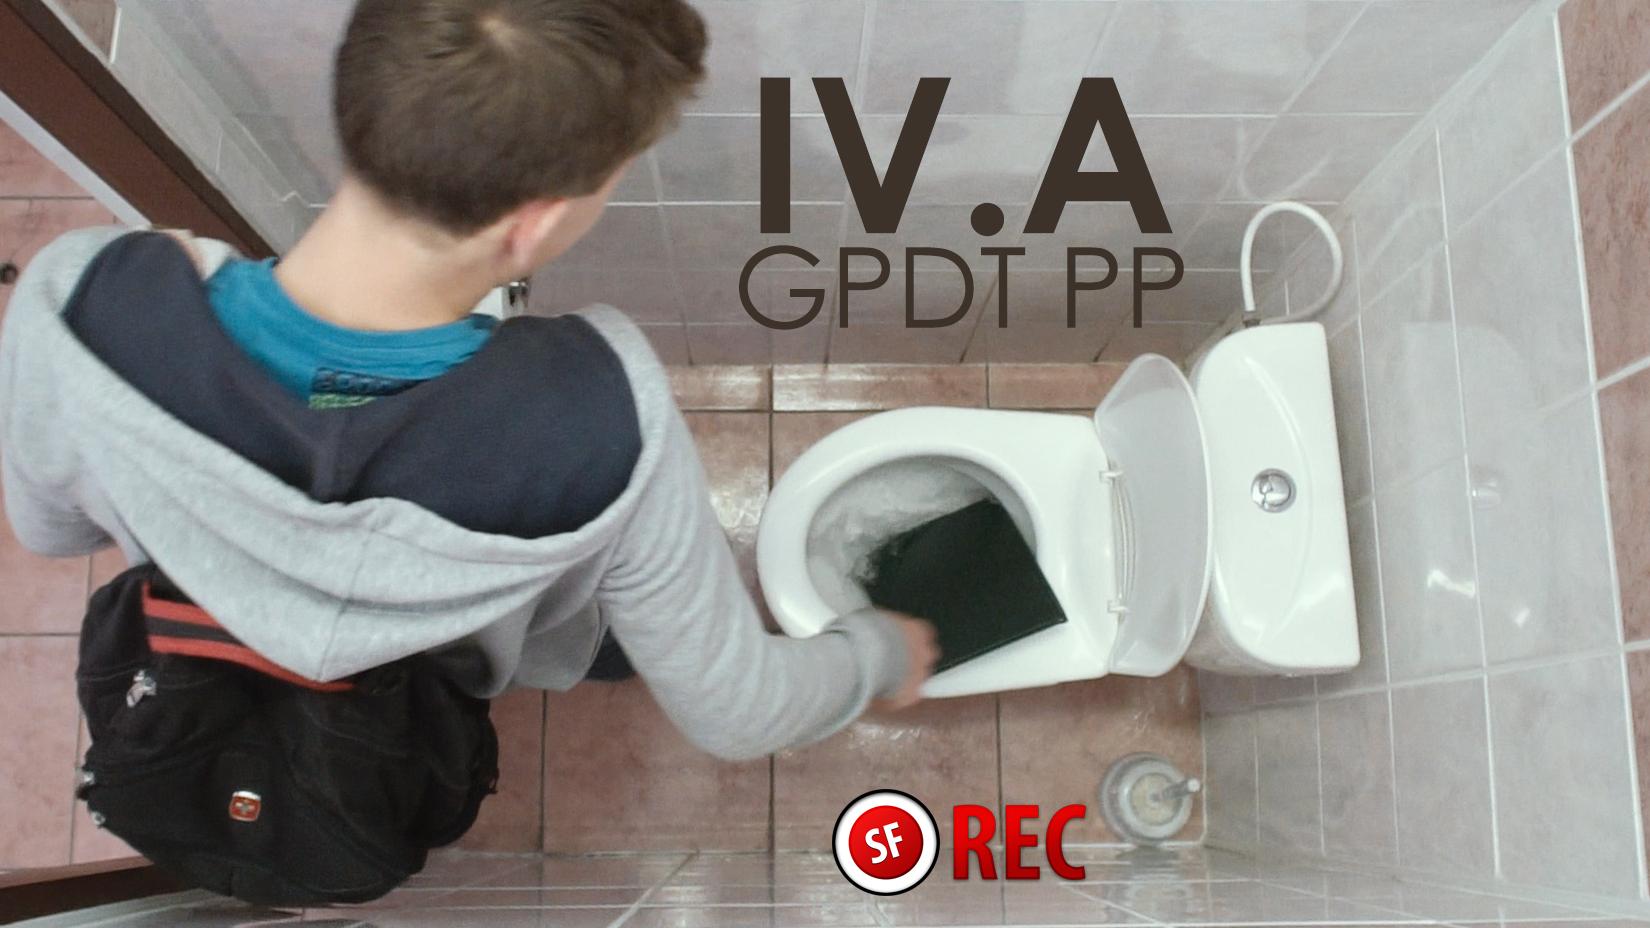 GPDT PP - IV.A - 2017